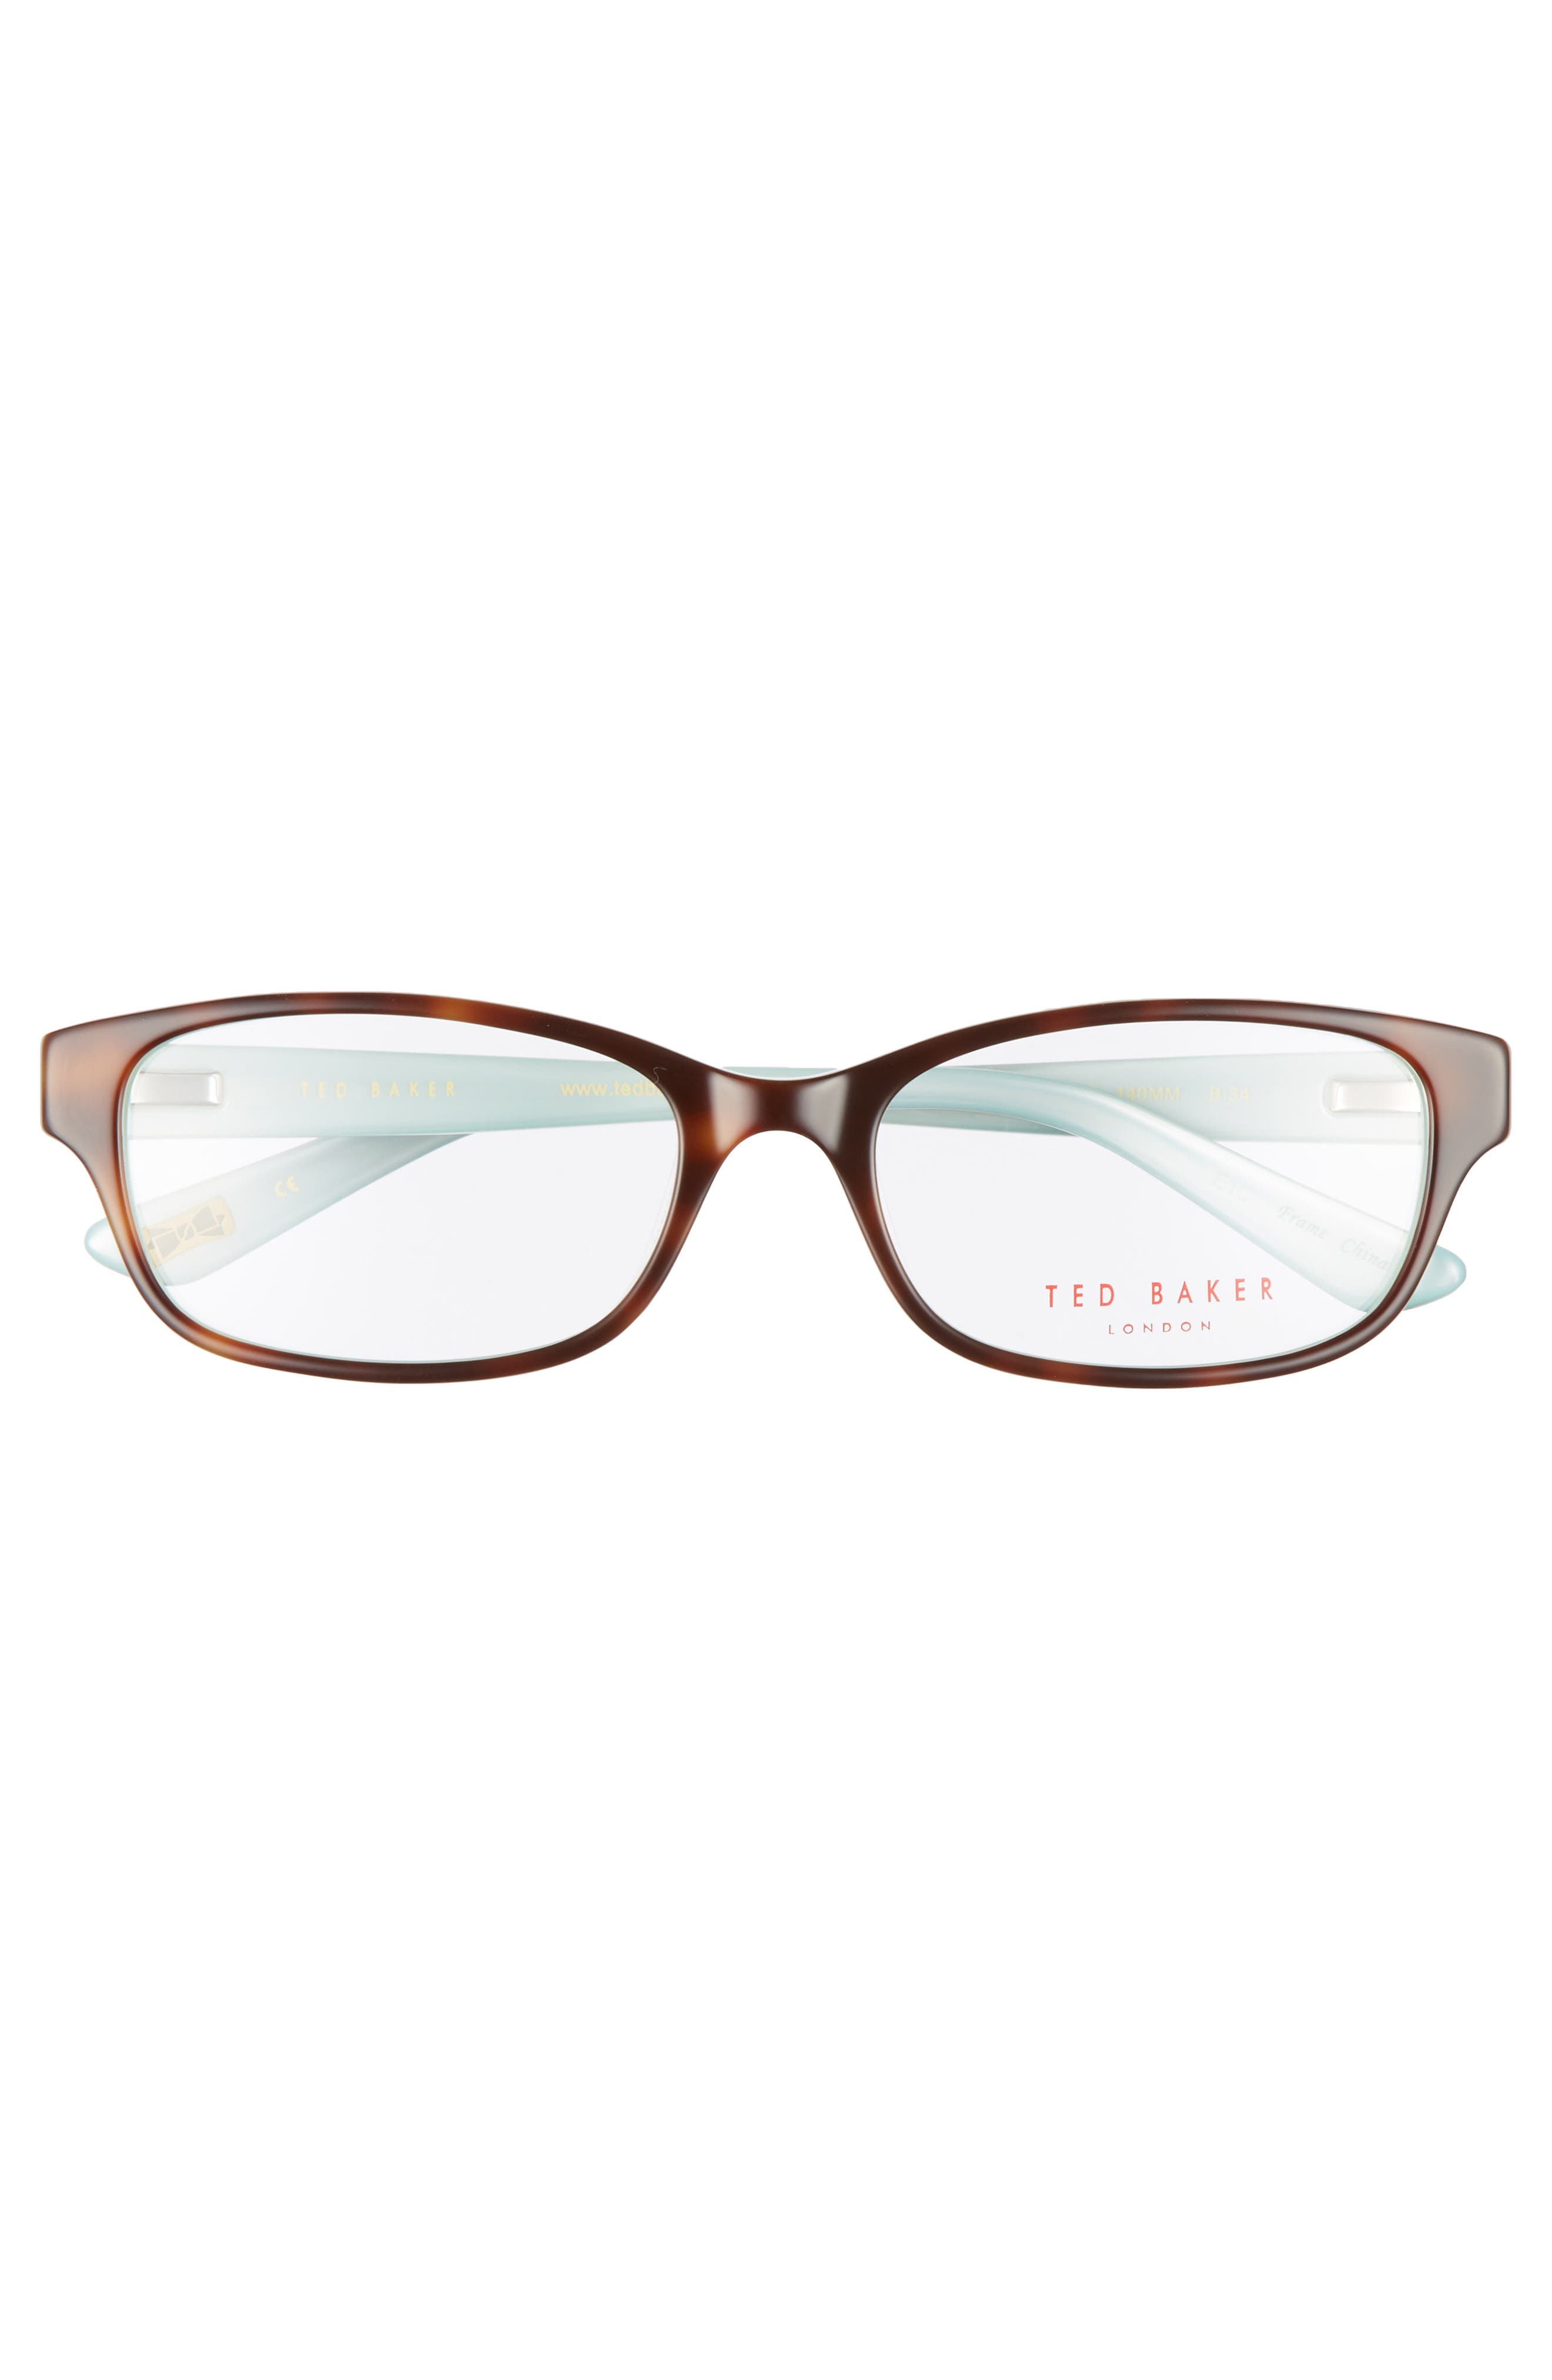 53mm Optical Glasses,                             Alternate thumbnail 3, color,                             200